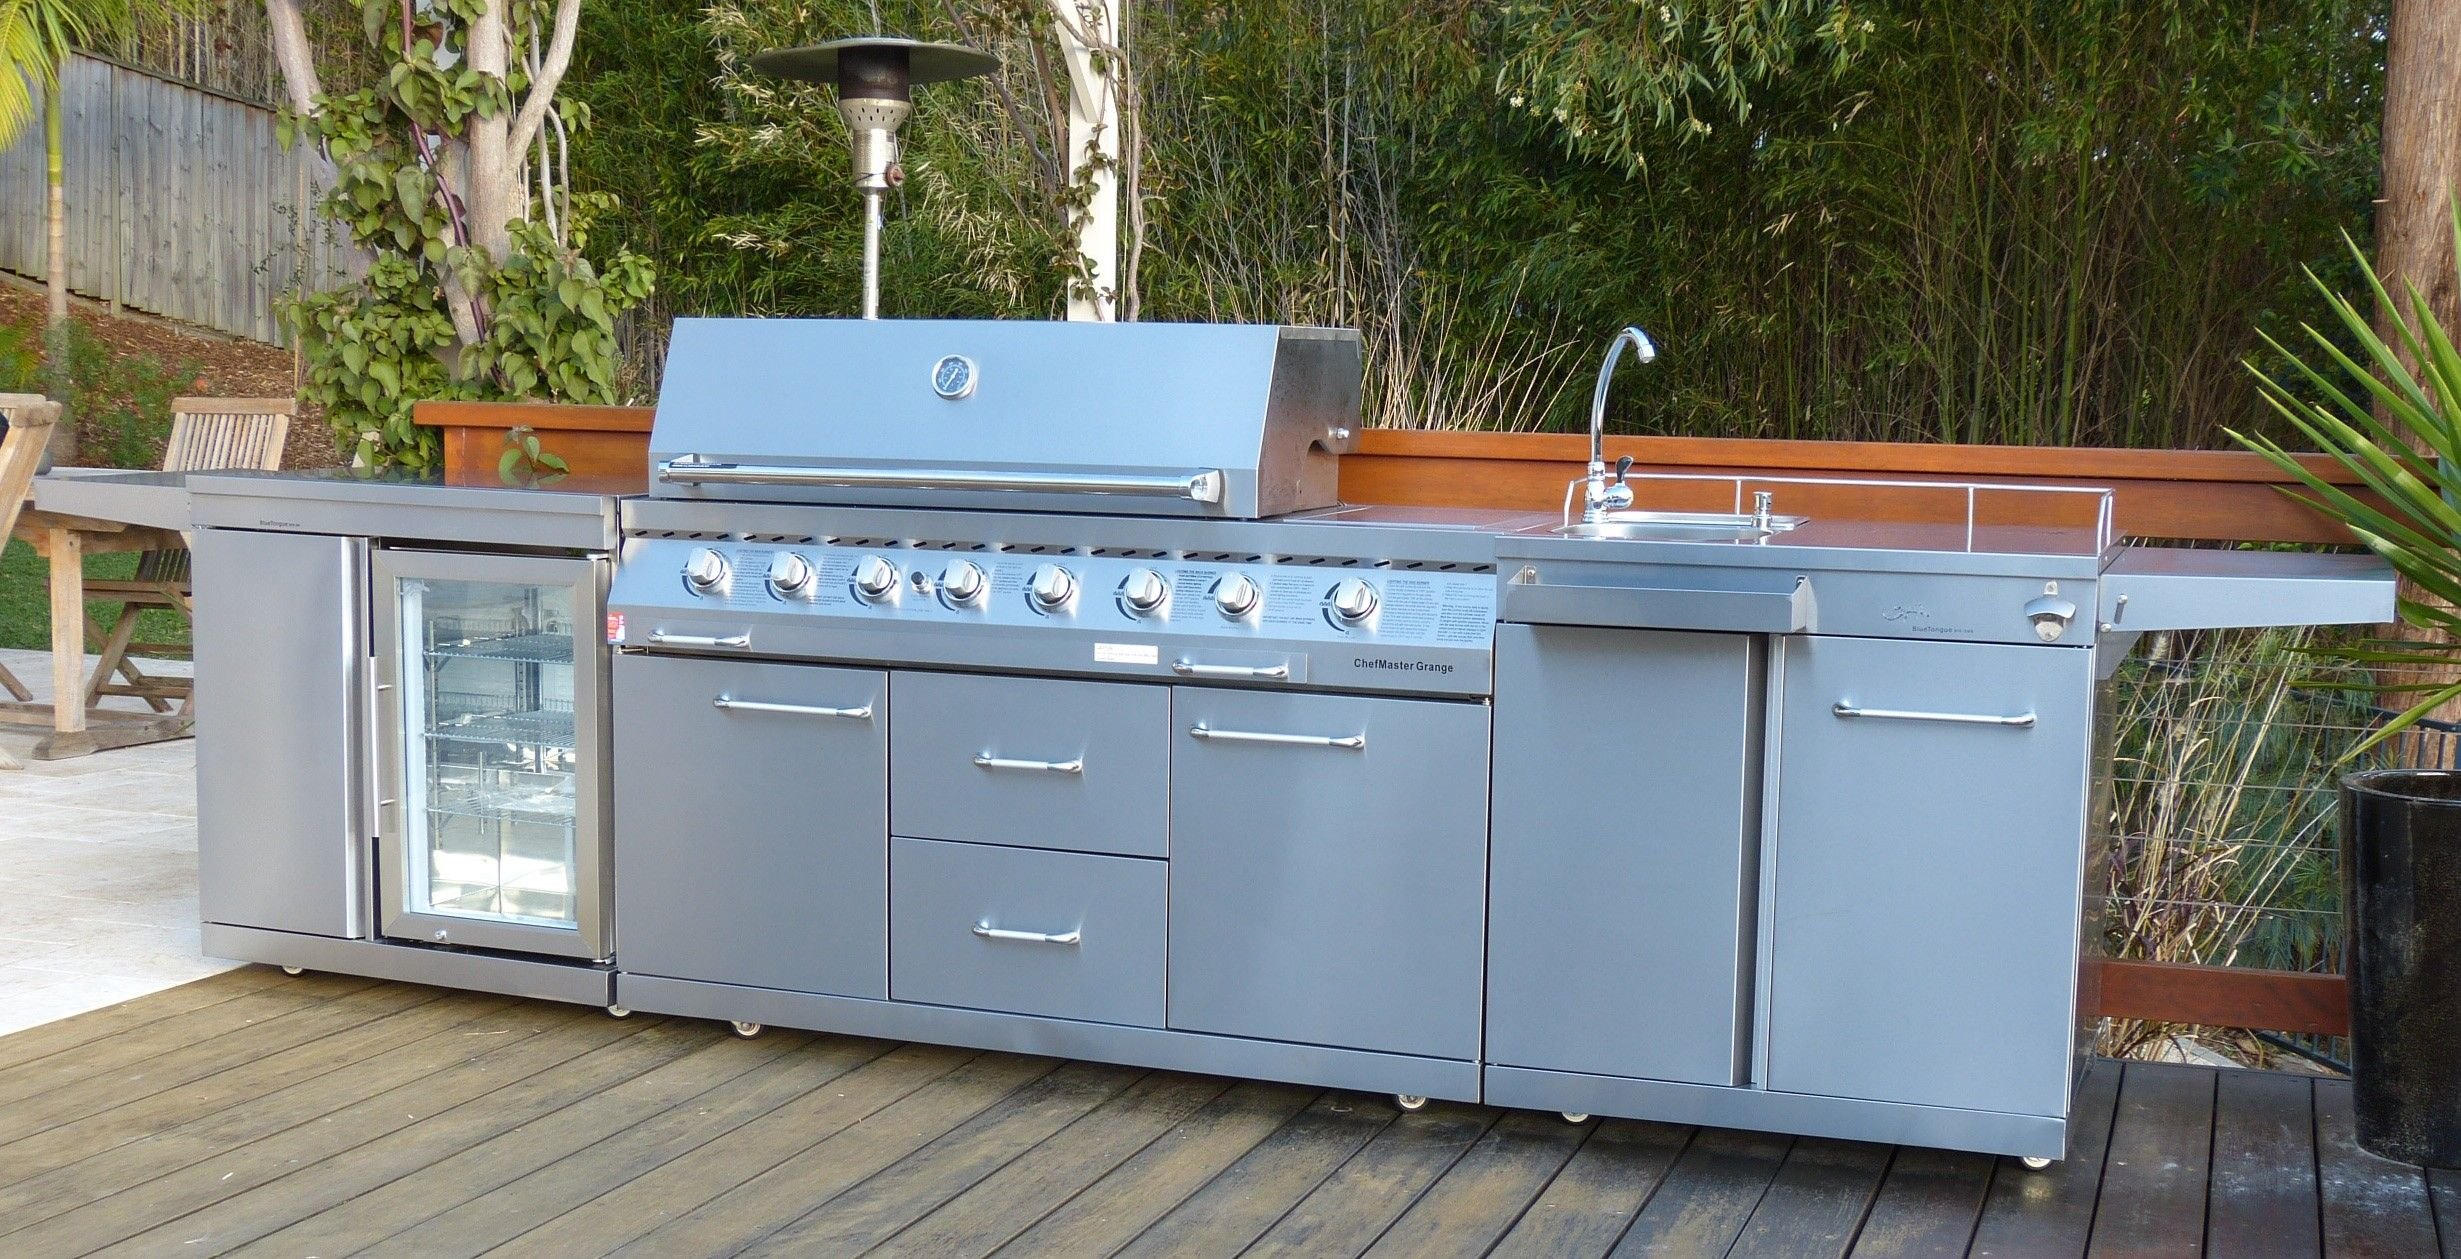 BT8KR 8 burner BBQ/Fridge/Sink combo outdoor kitchen